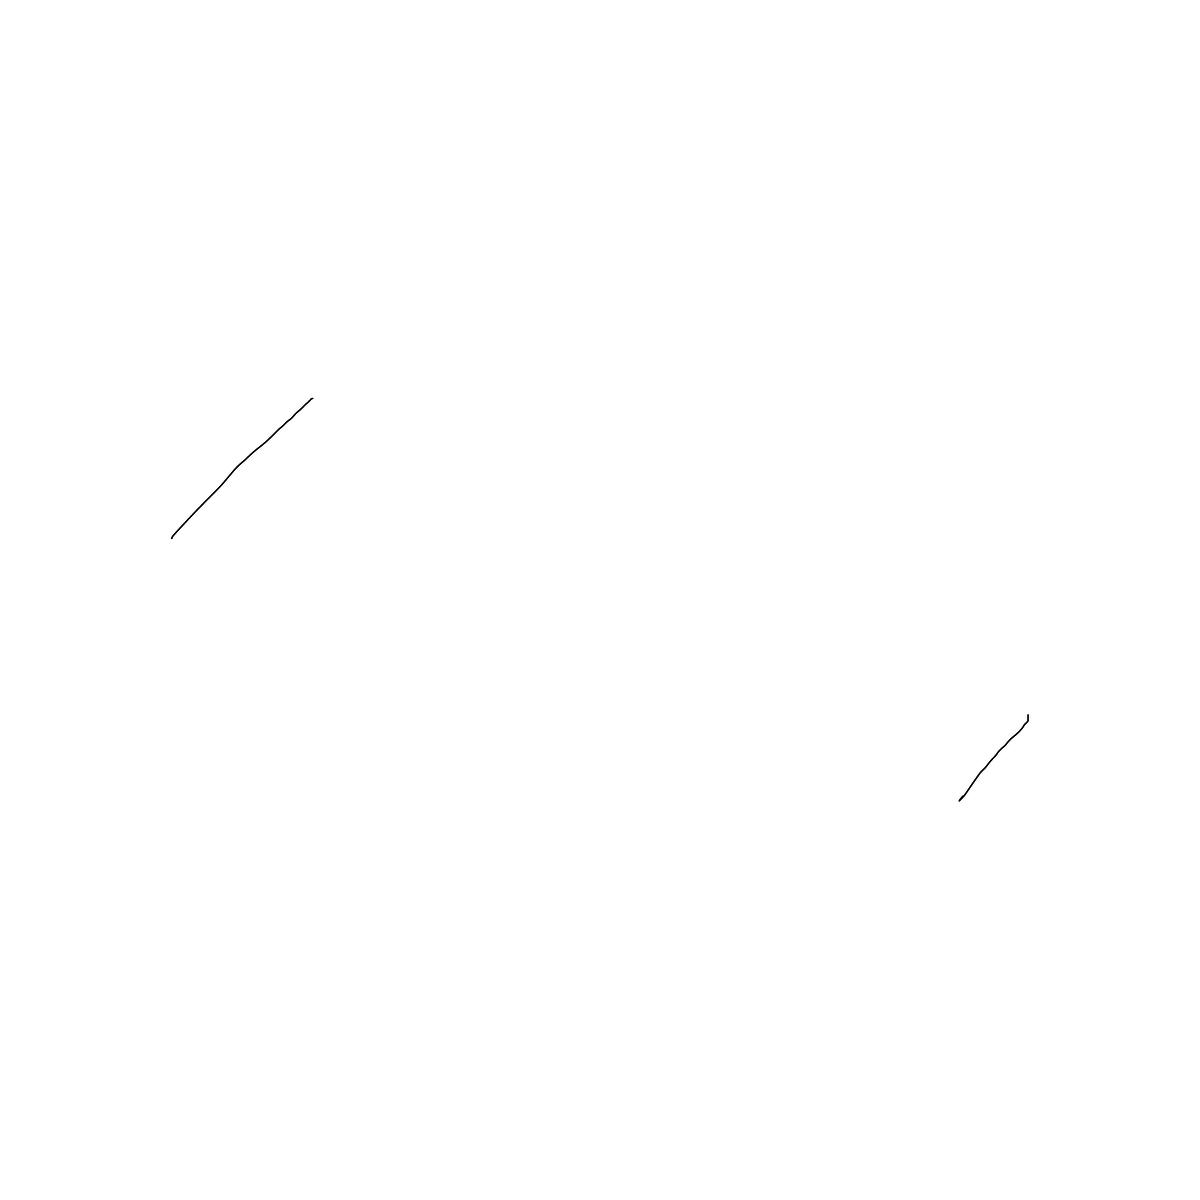 BAAAM drawing#13765 lat:45.3806228637695300lng: -73.5419769287109400